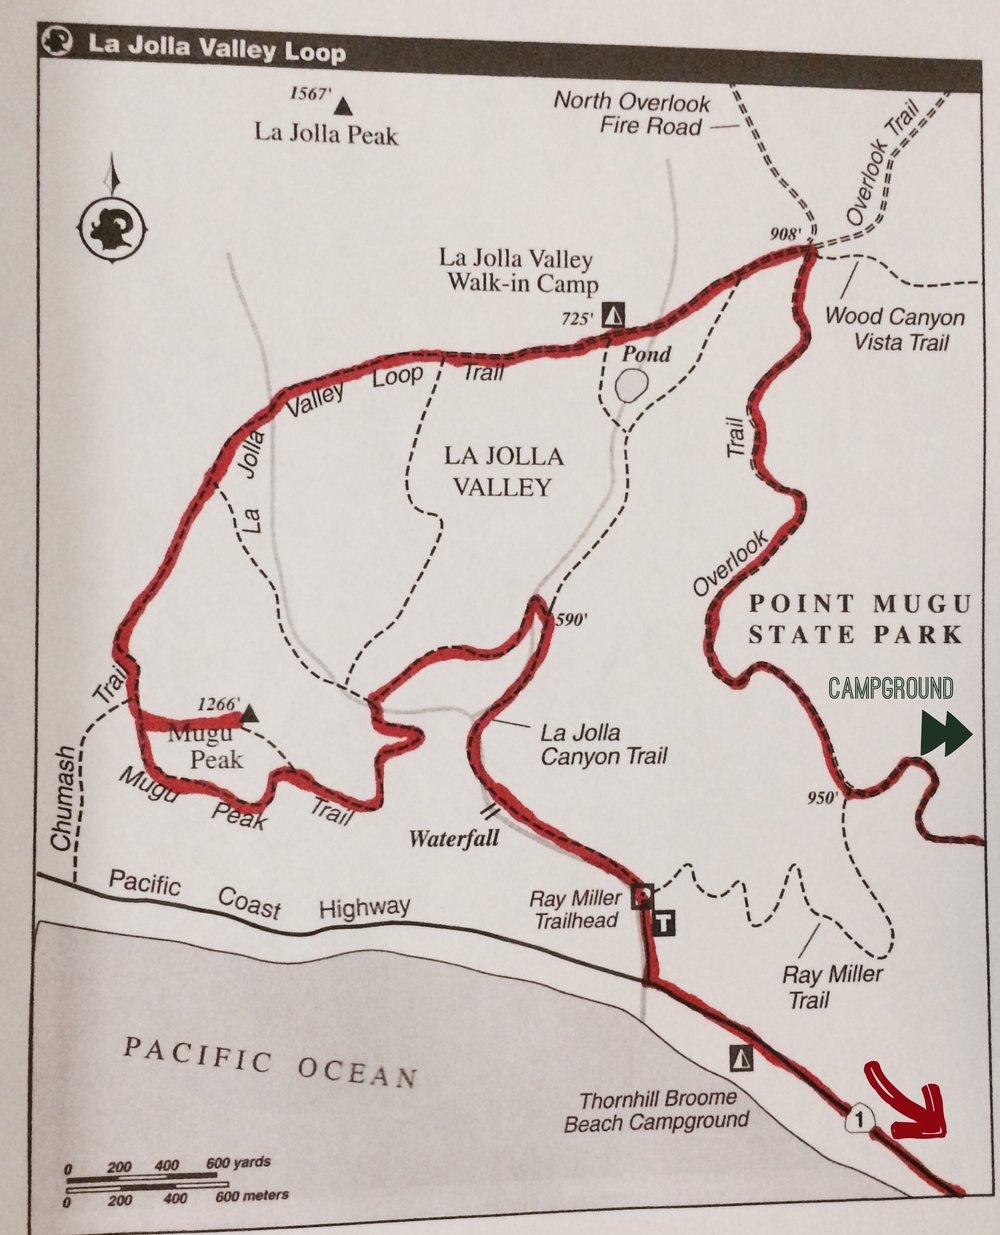 La Jolla Valley Loop Hike